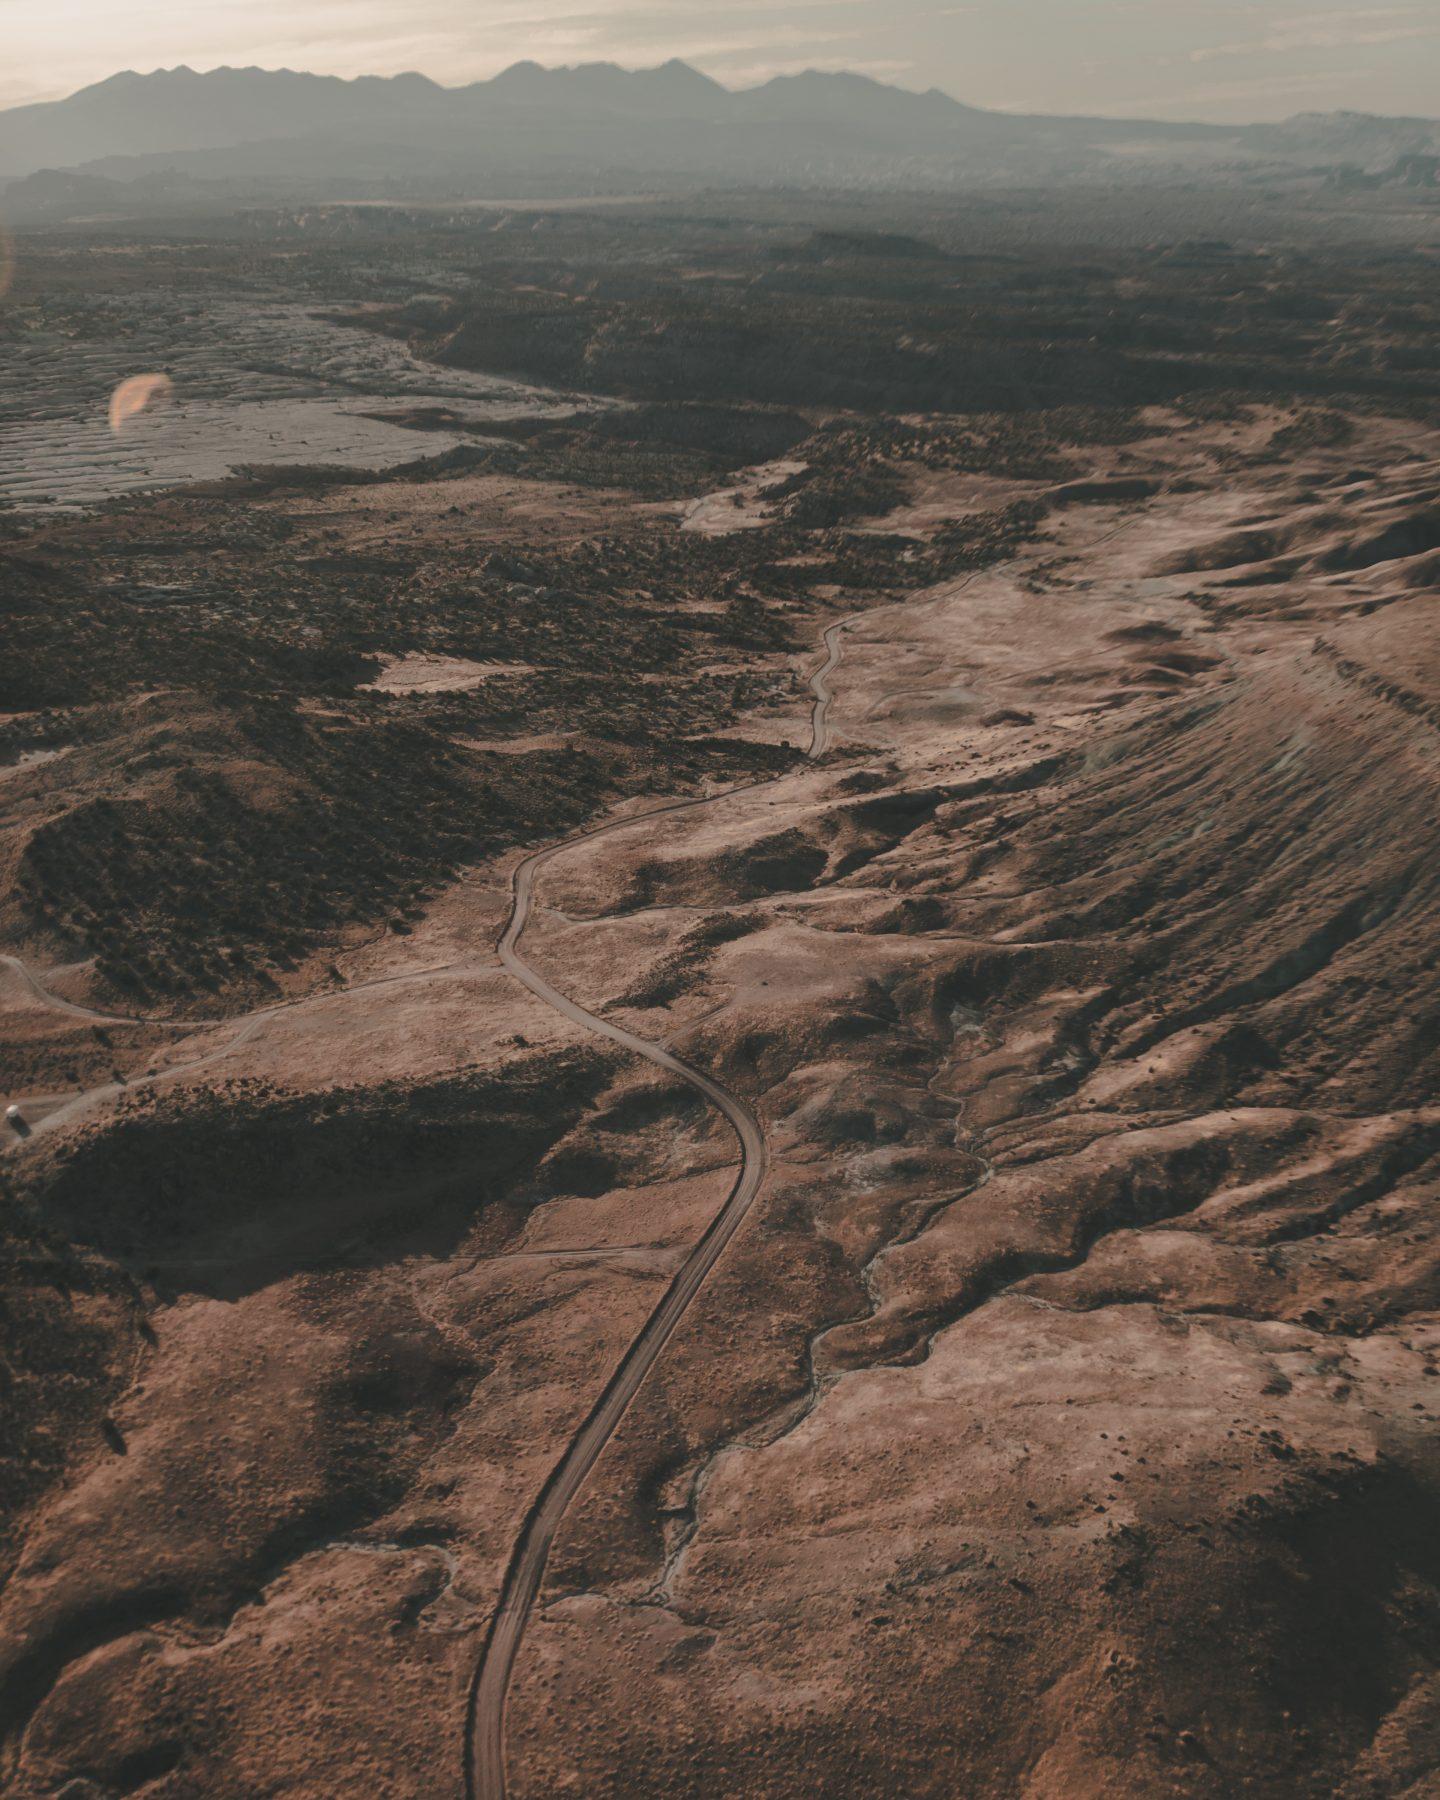 Moab Utah from a hot air balloon ride at sunrise